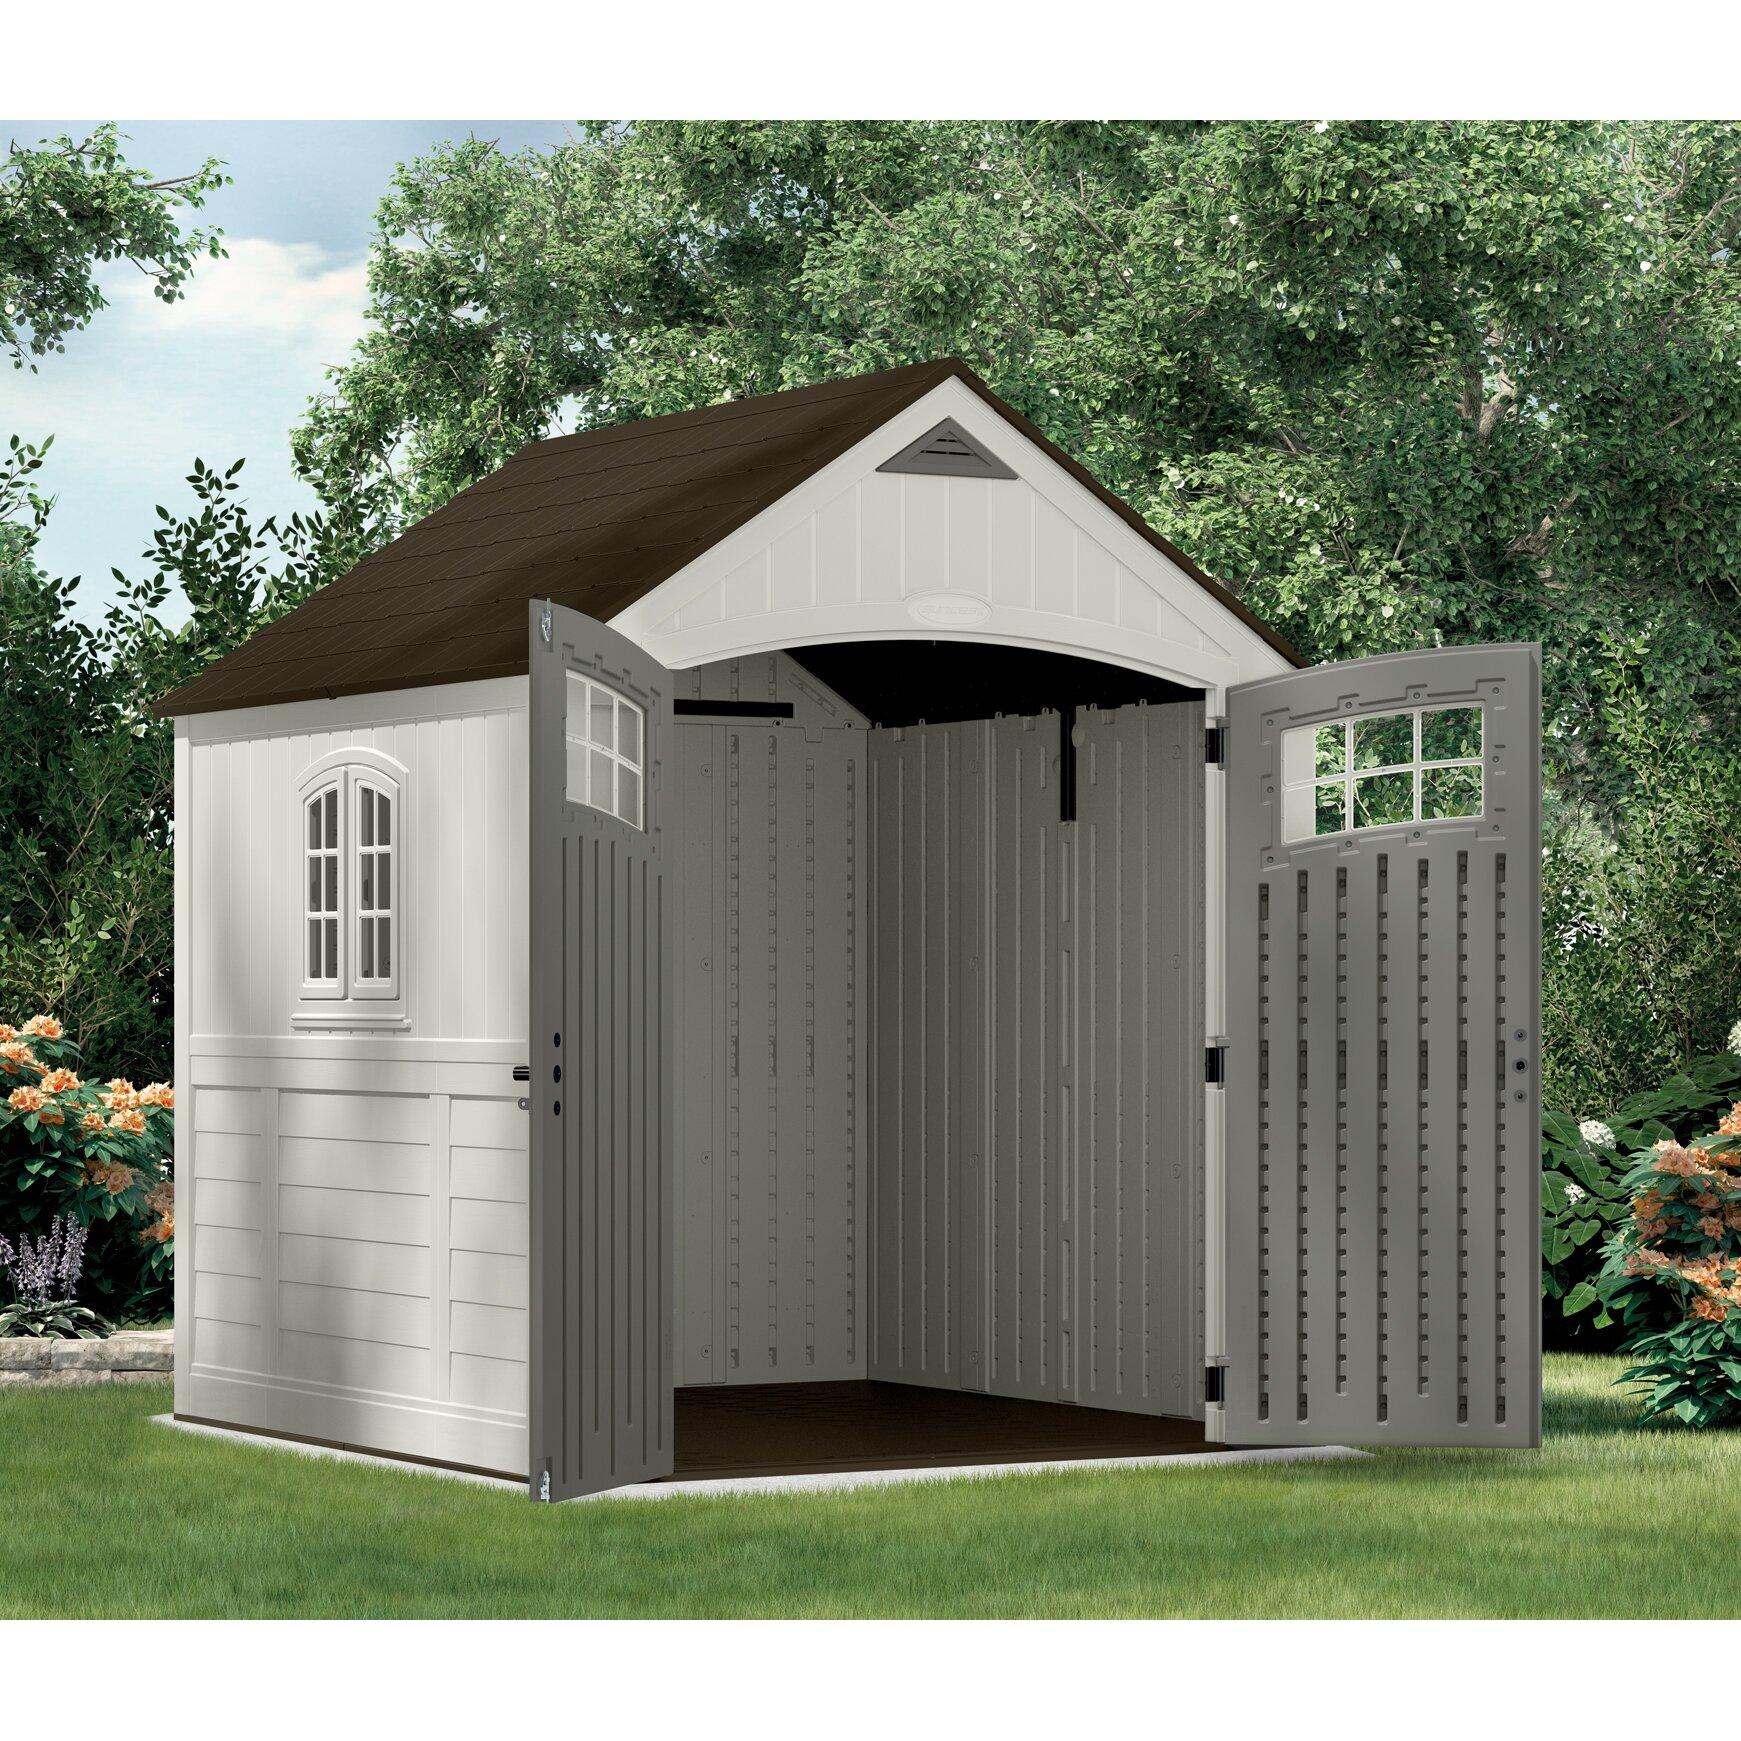 Suncast cascade 7 ft w x 7 ft d plastic storage shed for Garden shed 7 x 5